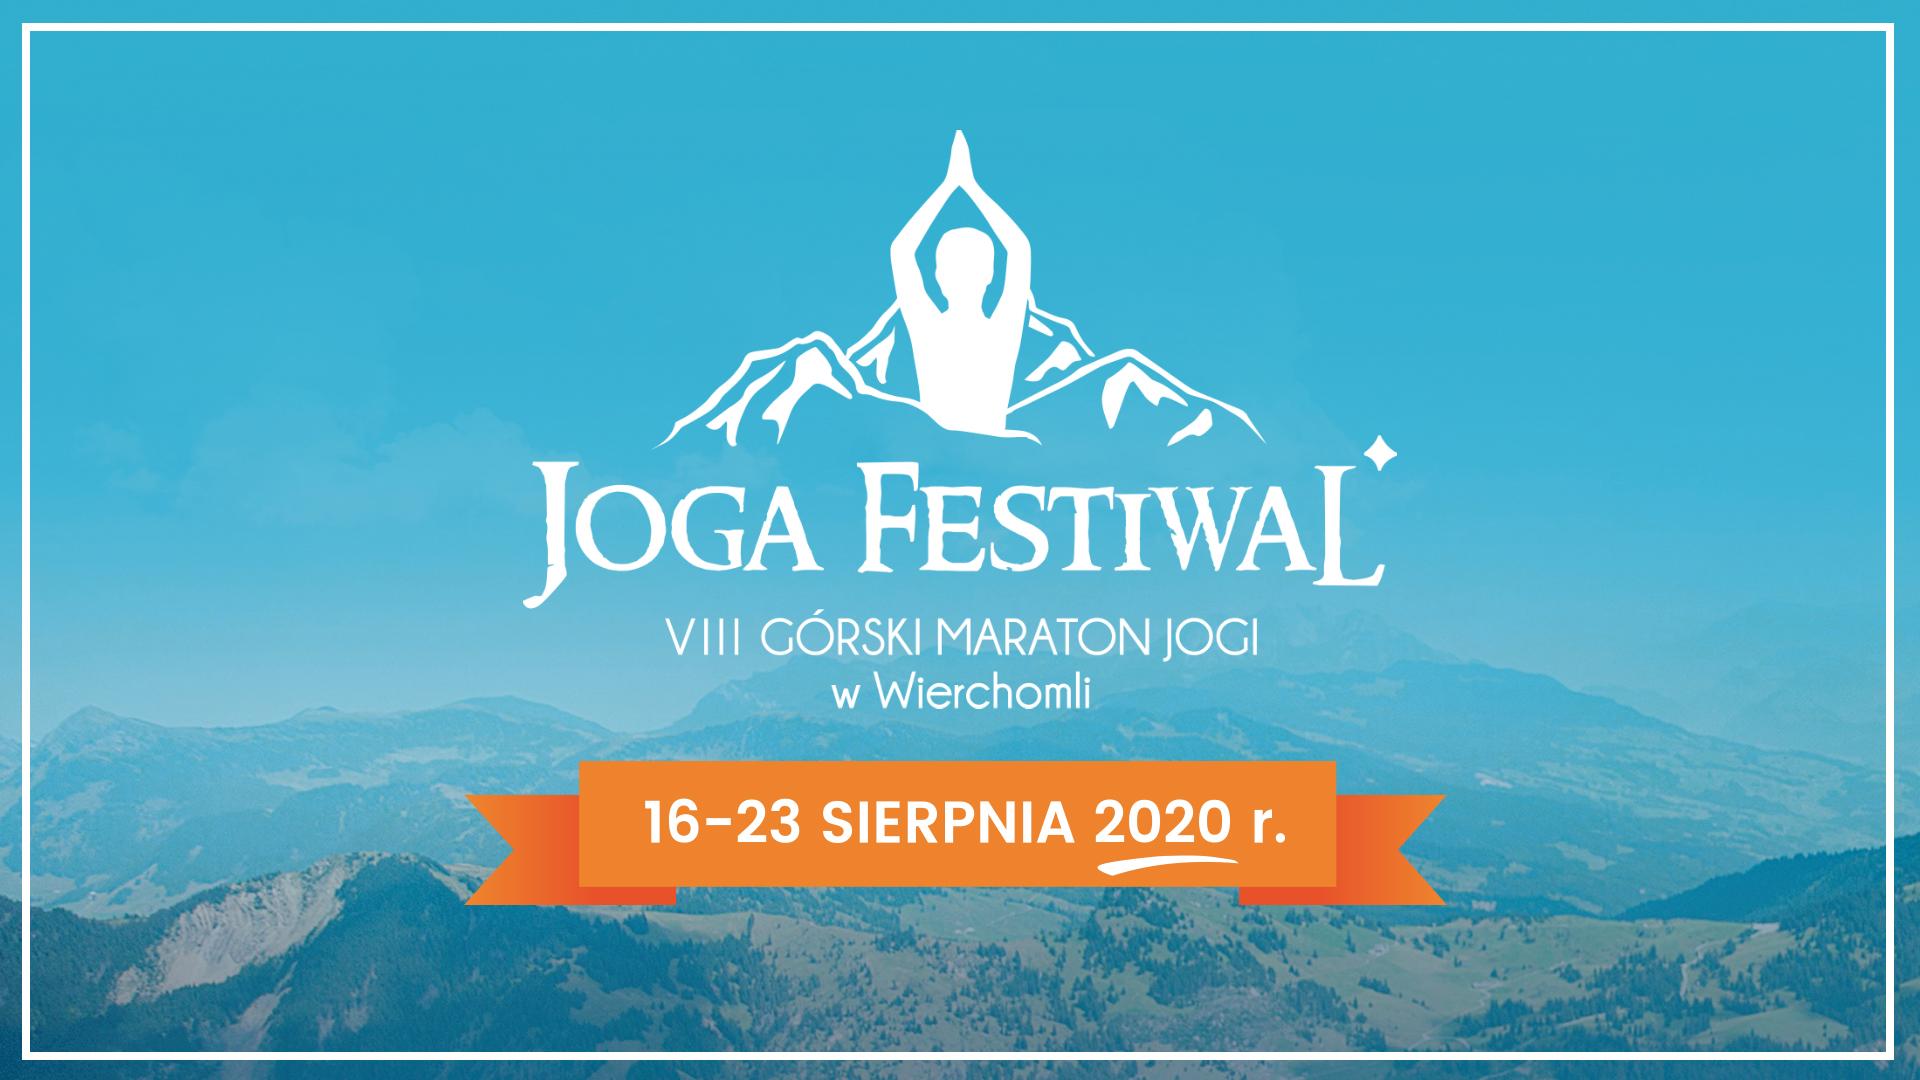 hipoalergiczni-joga-festiwal-osmy-baner-patronat-medialny-1920x1080